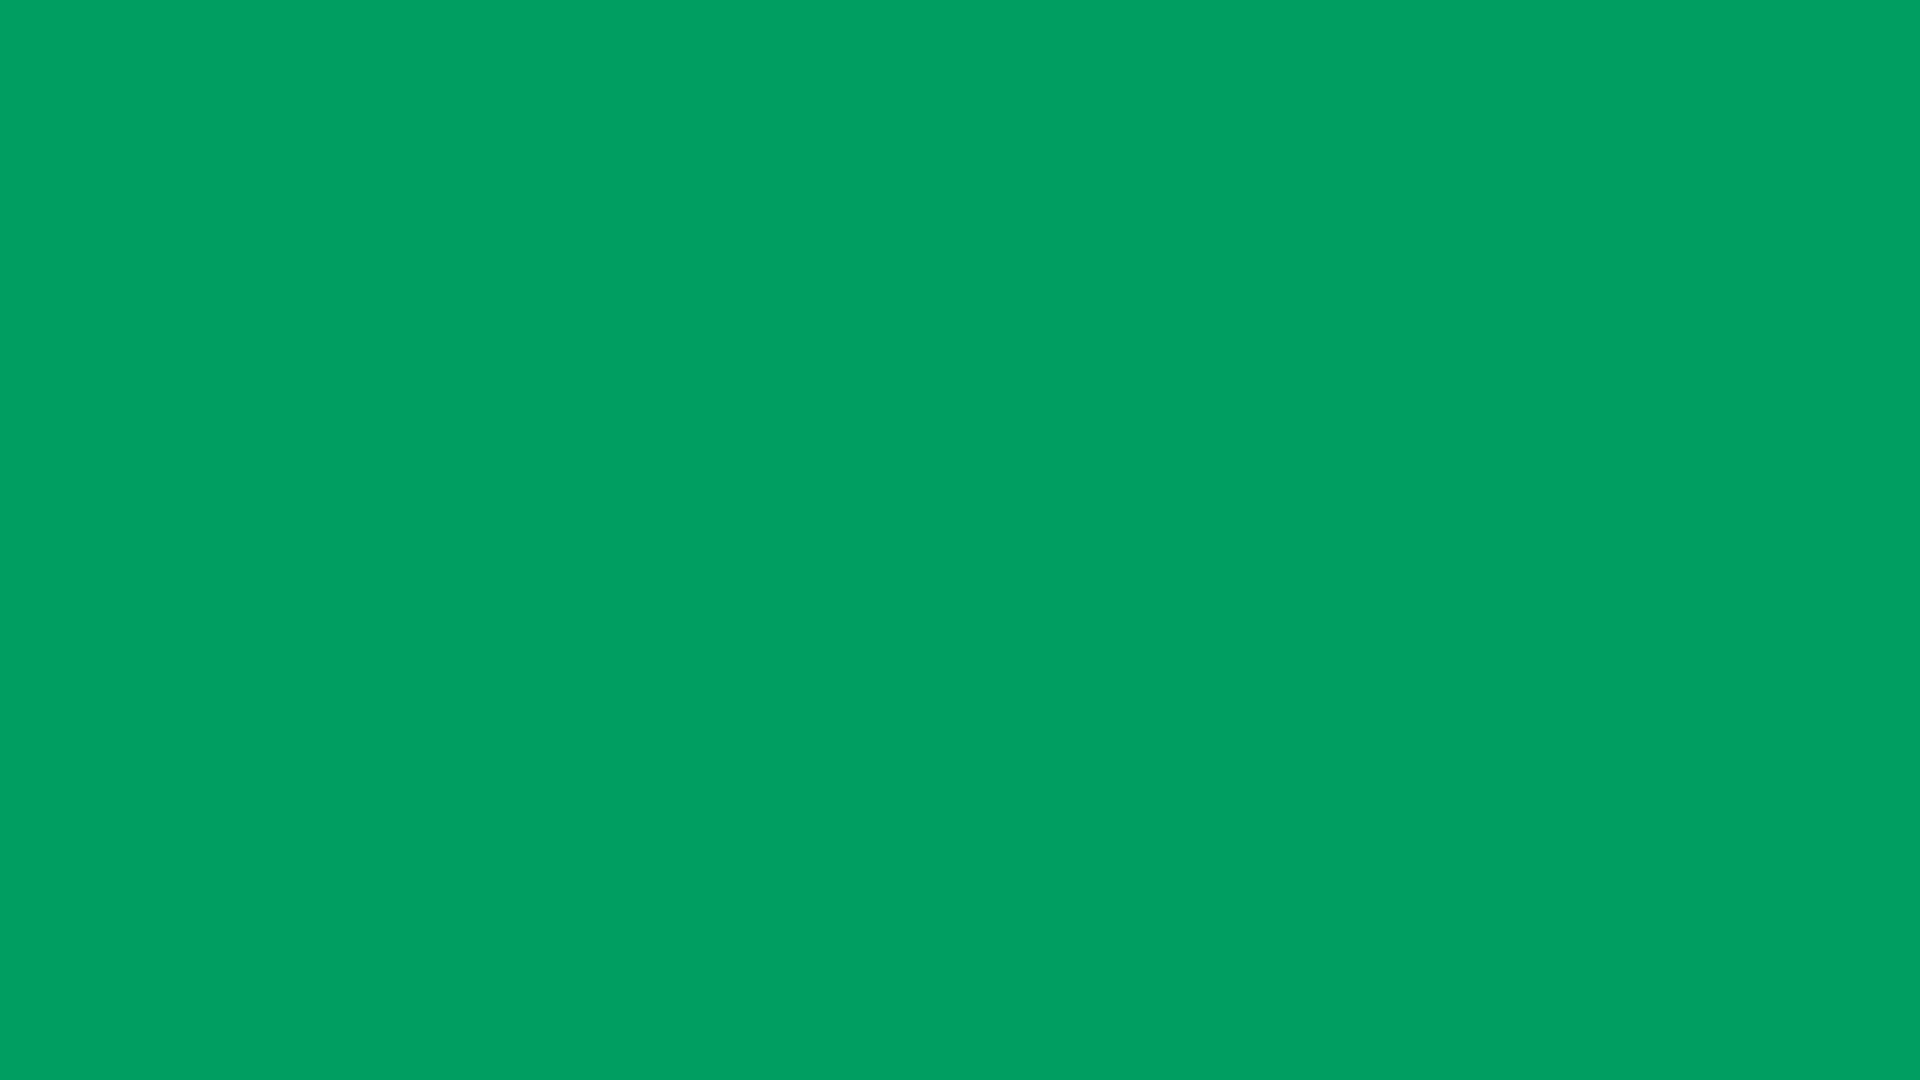 1920x1080 Shamrock Green Solid Color Background